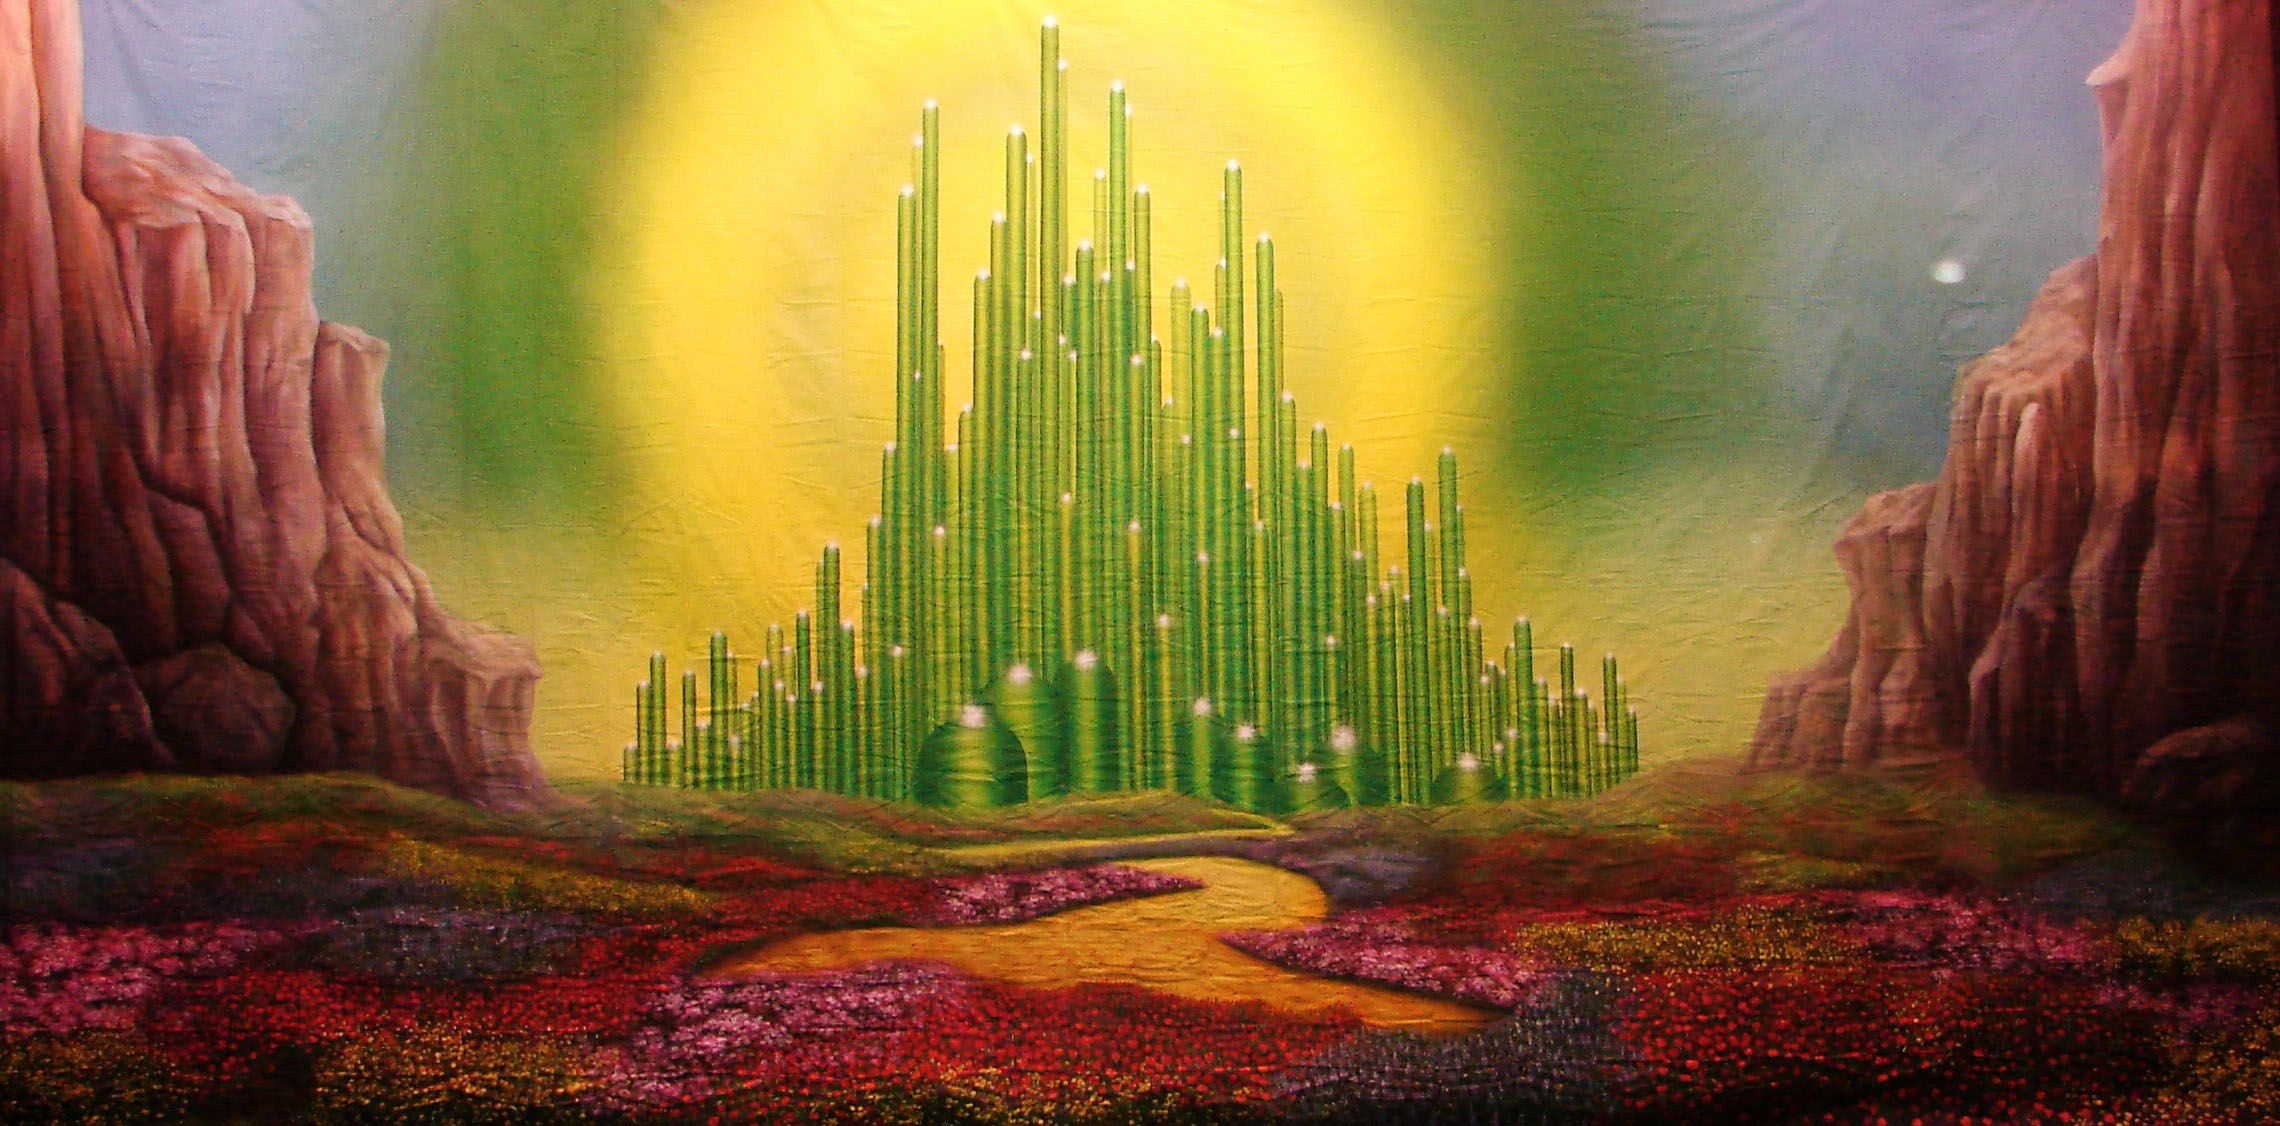 Wizard Of Oz Emerald City Poppy Fields Backdrop Image